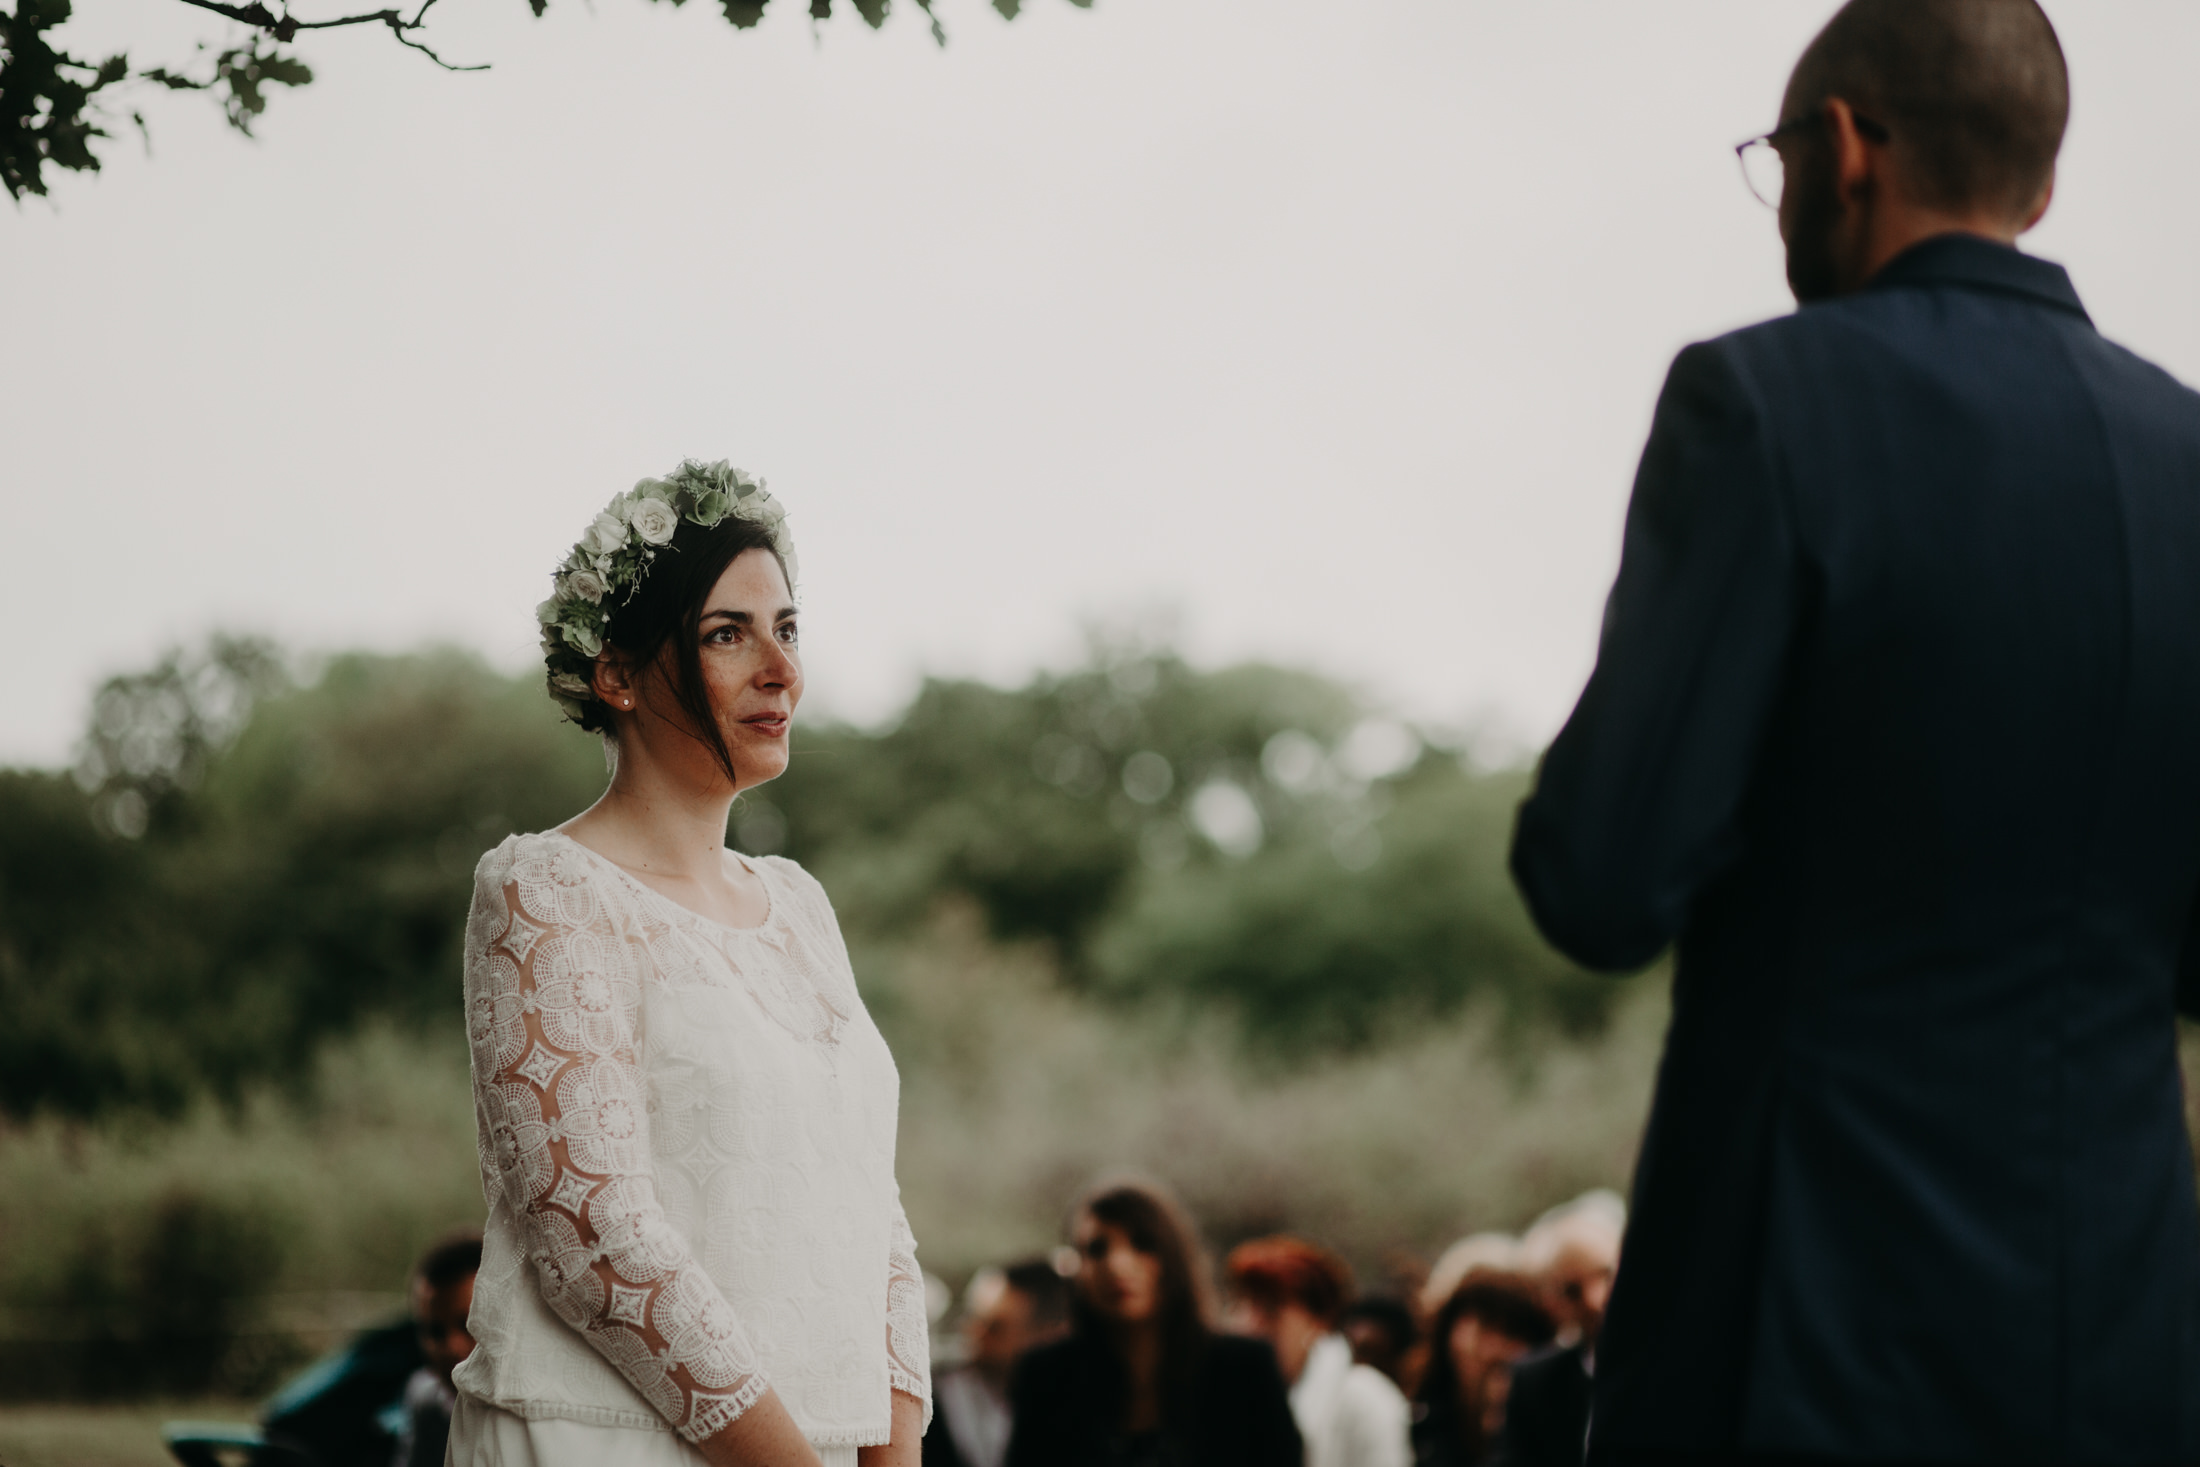 Mariage alsace germany wedding kid-46.jpg